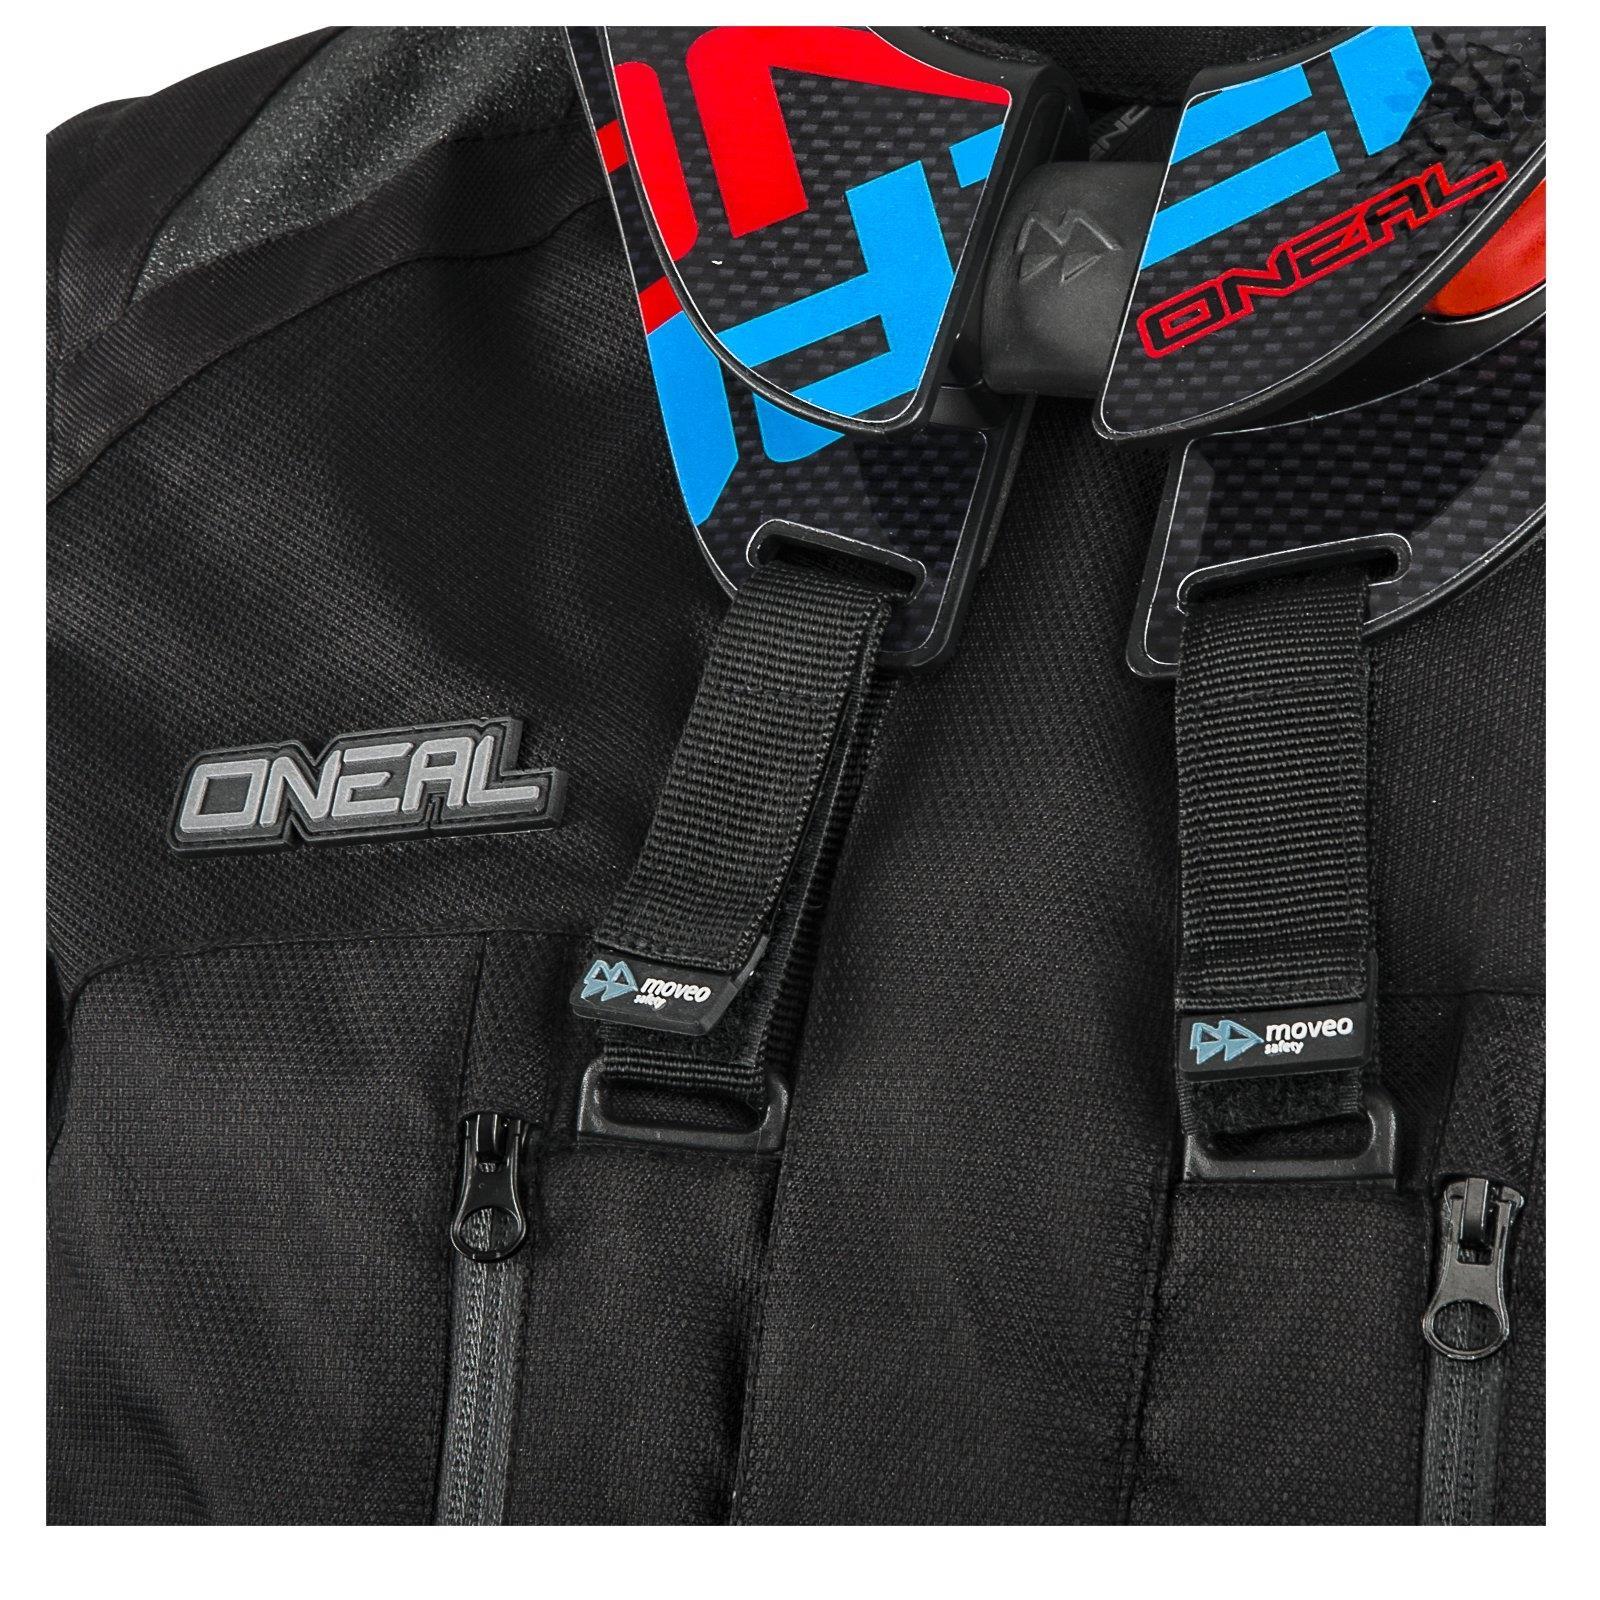 Oneal Baja Racing Enduro Moto Veste terrain MX trajet Touring moto cross SX